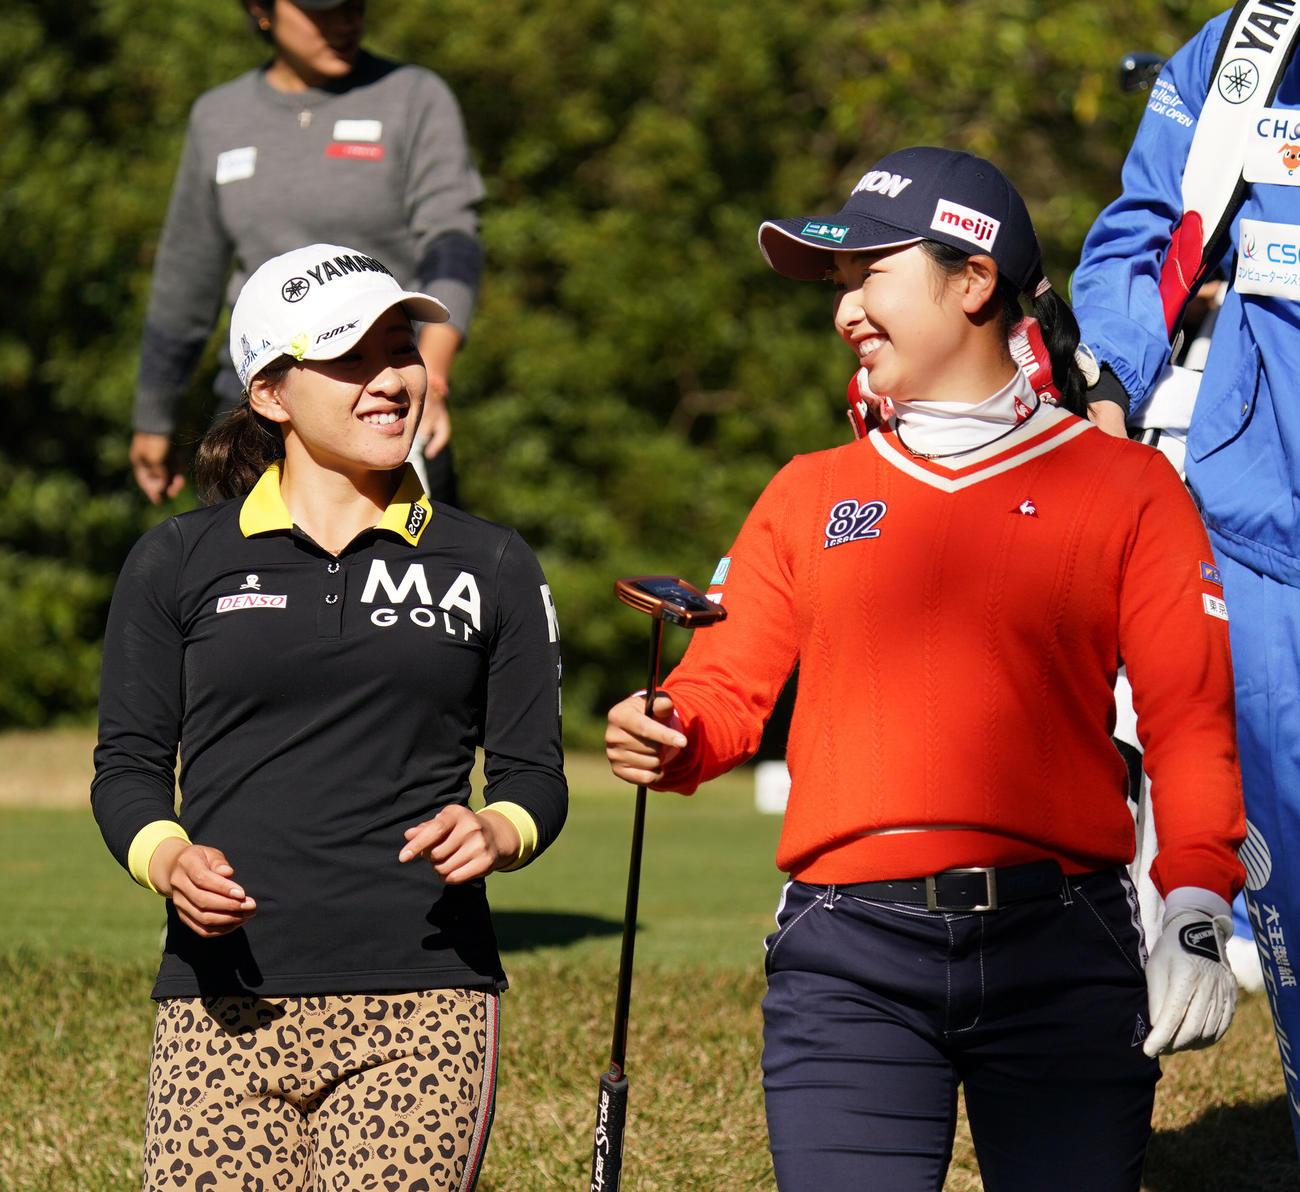 https://www.nikkansports.com/sports/golf/news/img/202011210000060-w1300_19.jpg